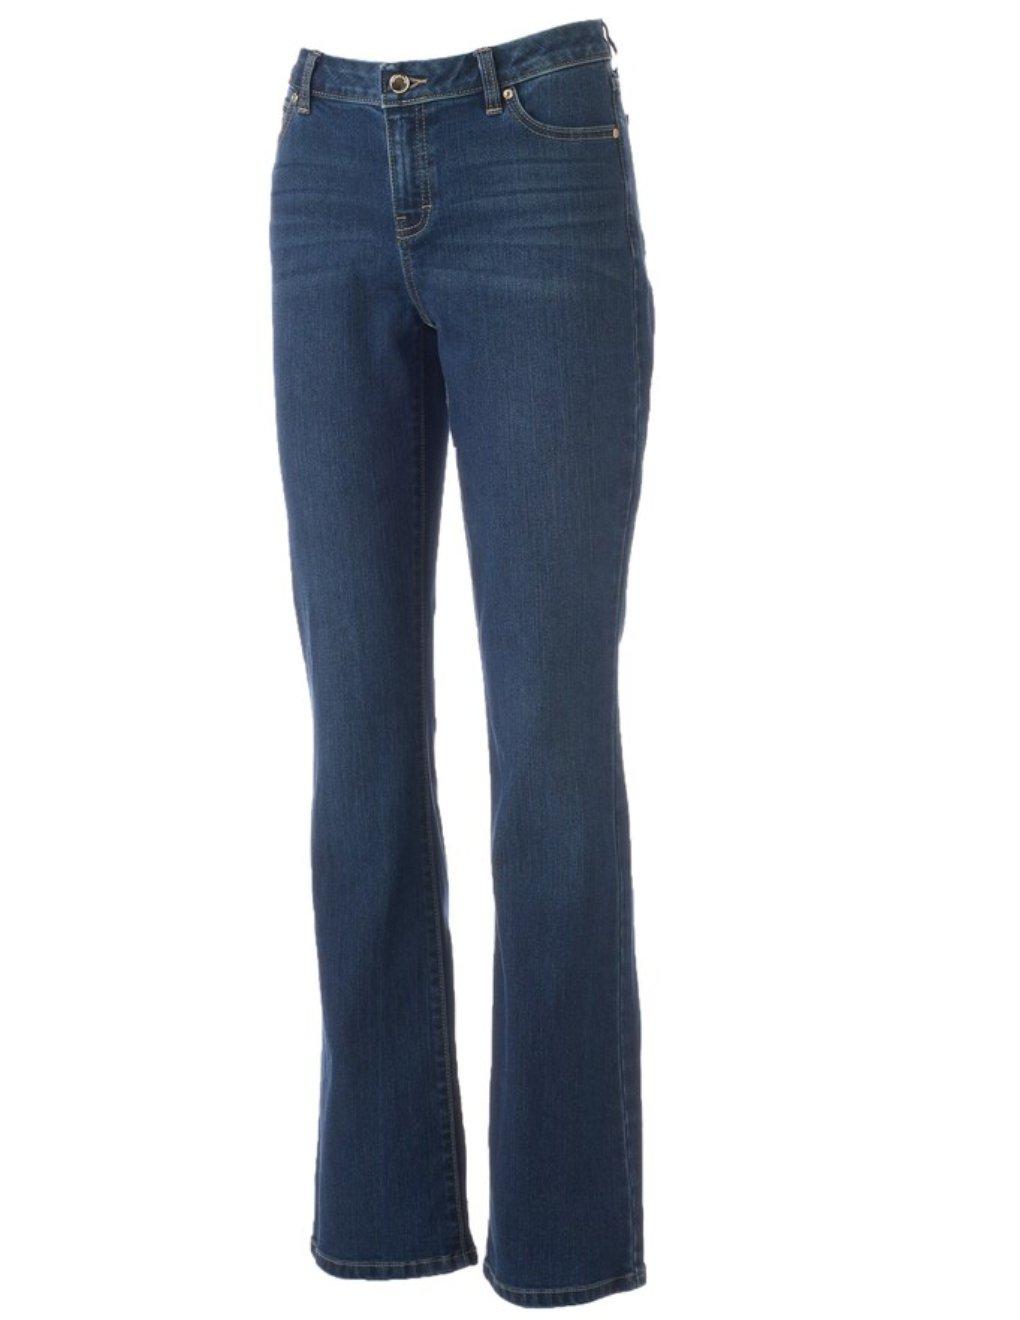 NEW Womens Jennifer Lopez Curvy Fit Stretch Bootcut Jeans Sz 2 in Medium Wash Luminous